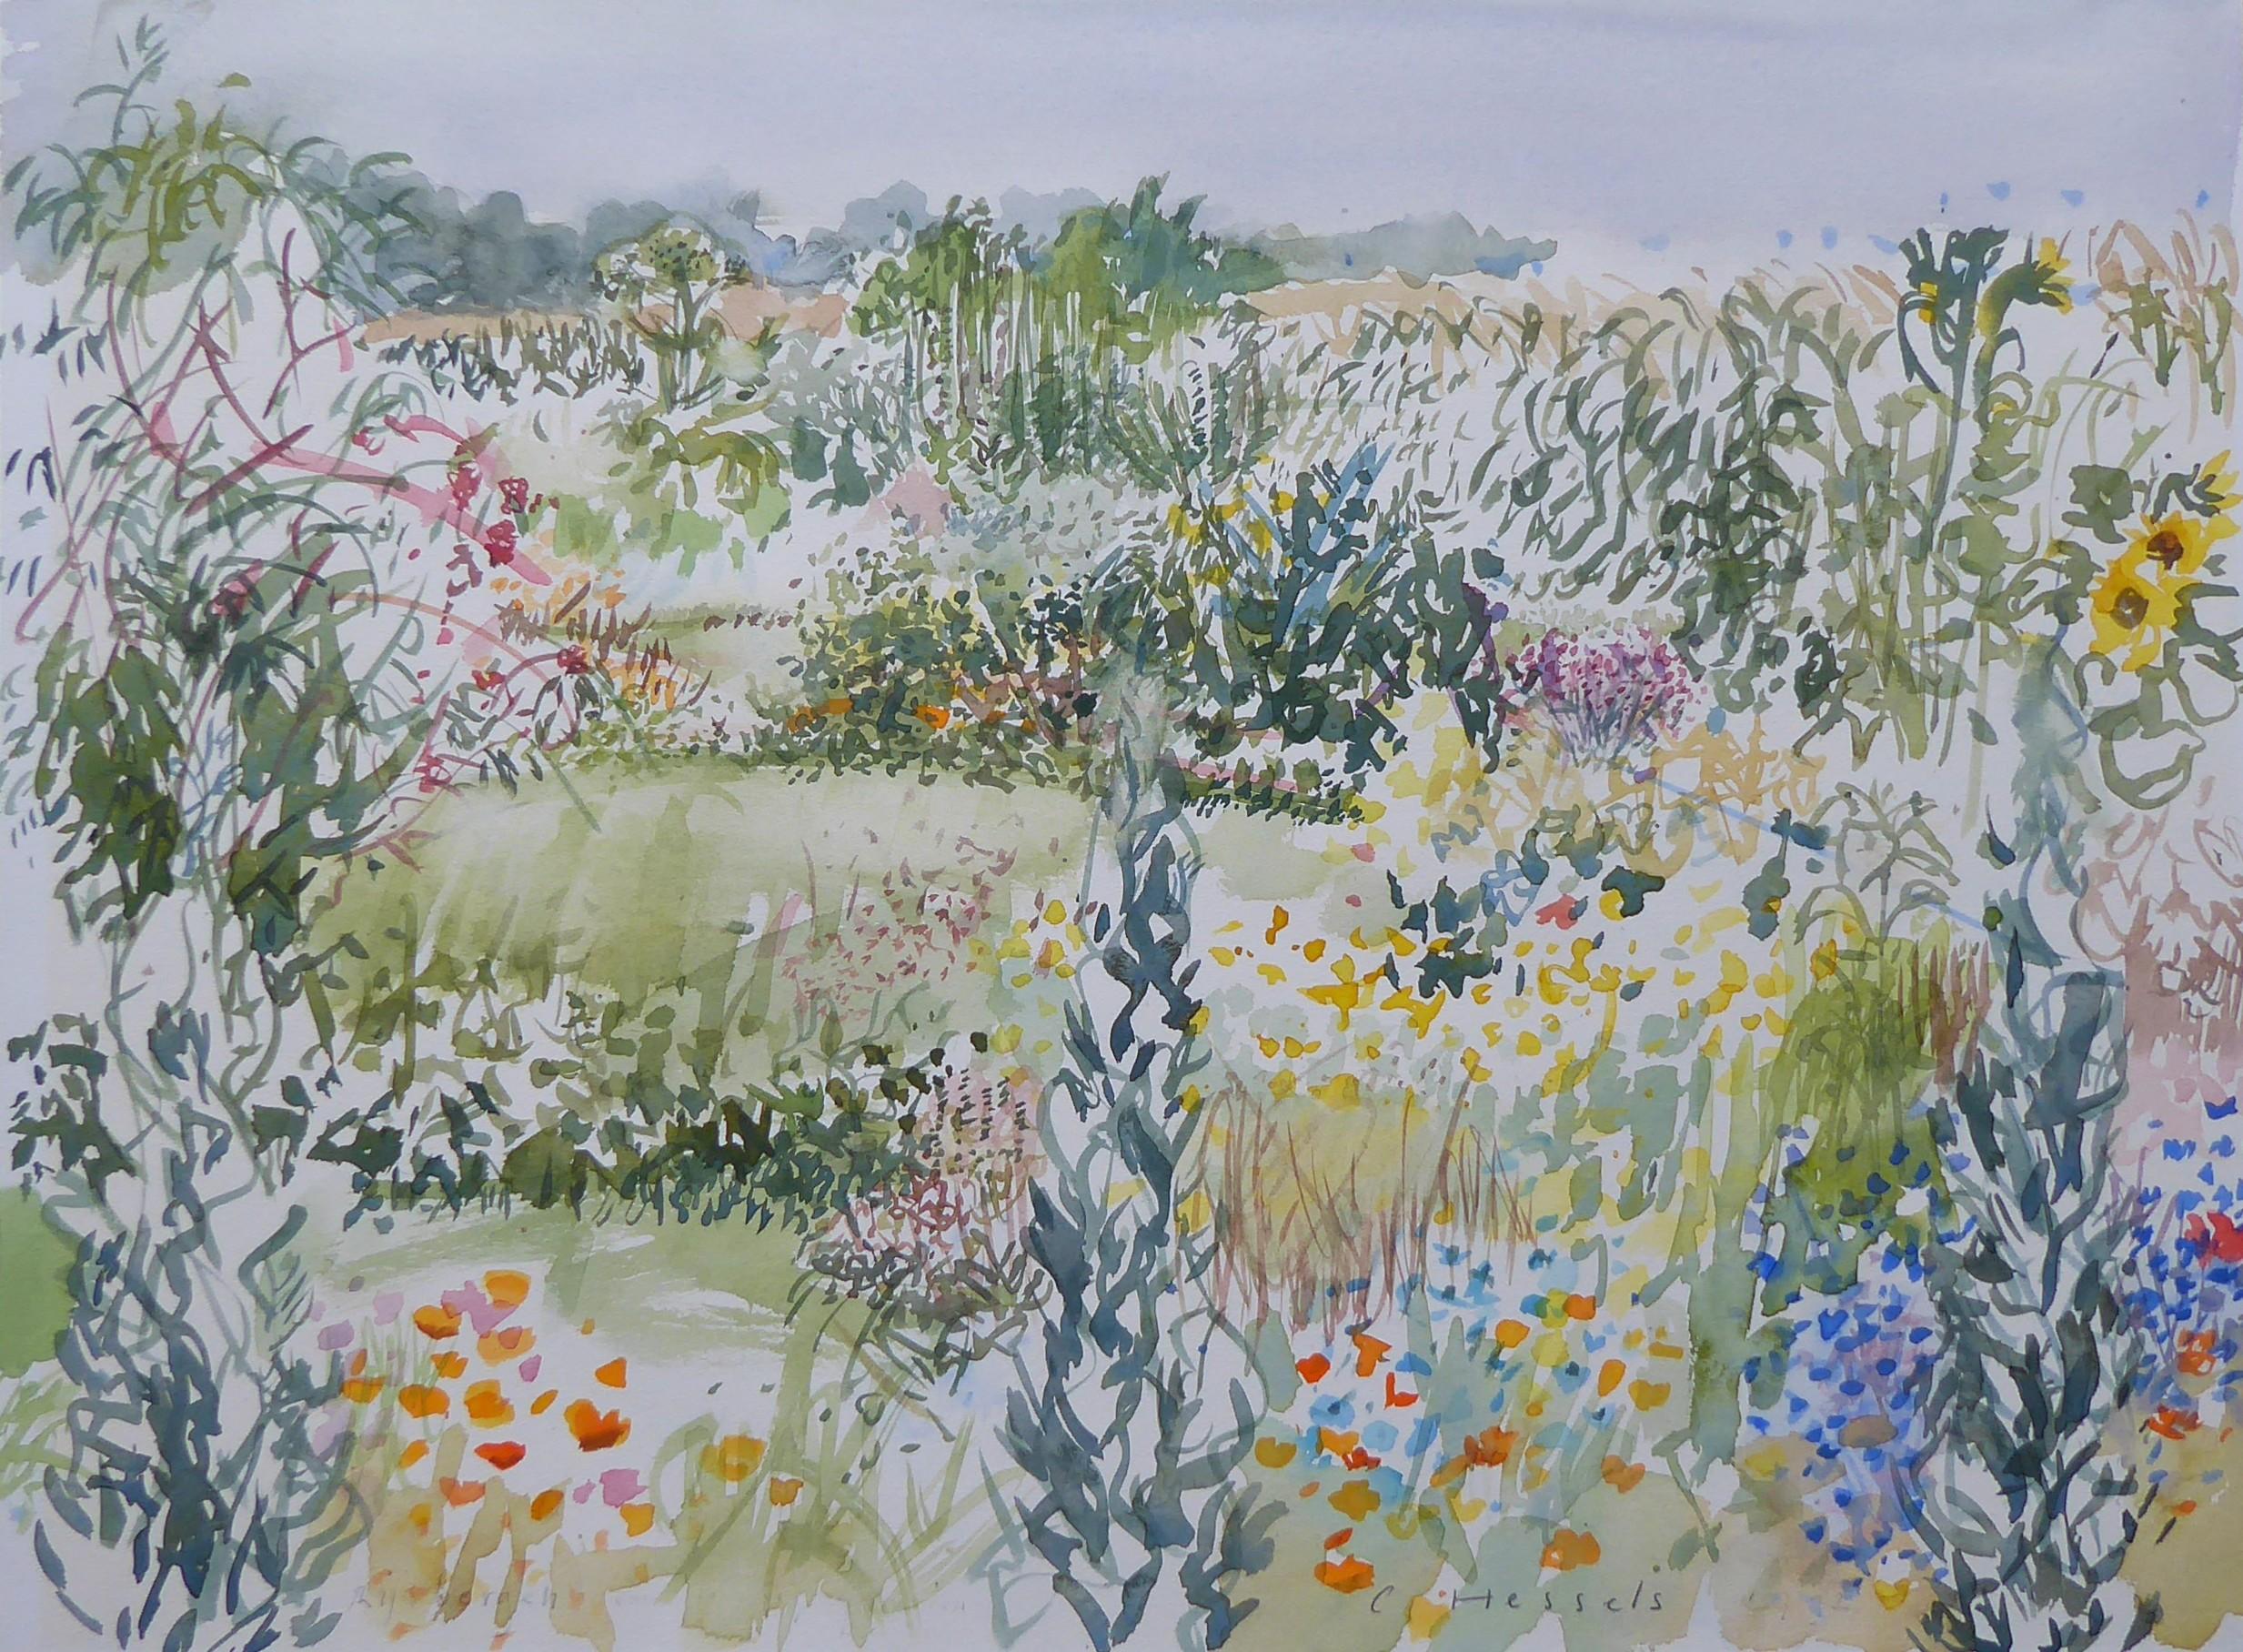 zomertuin het land